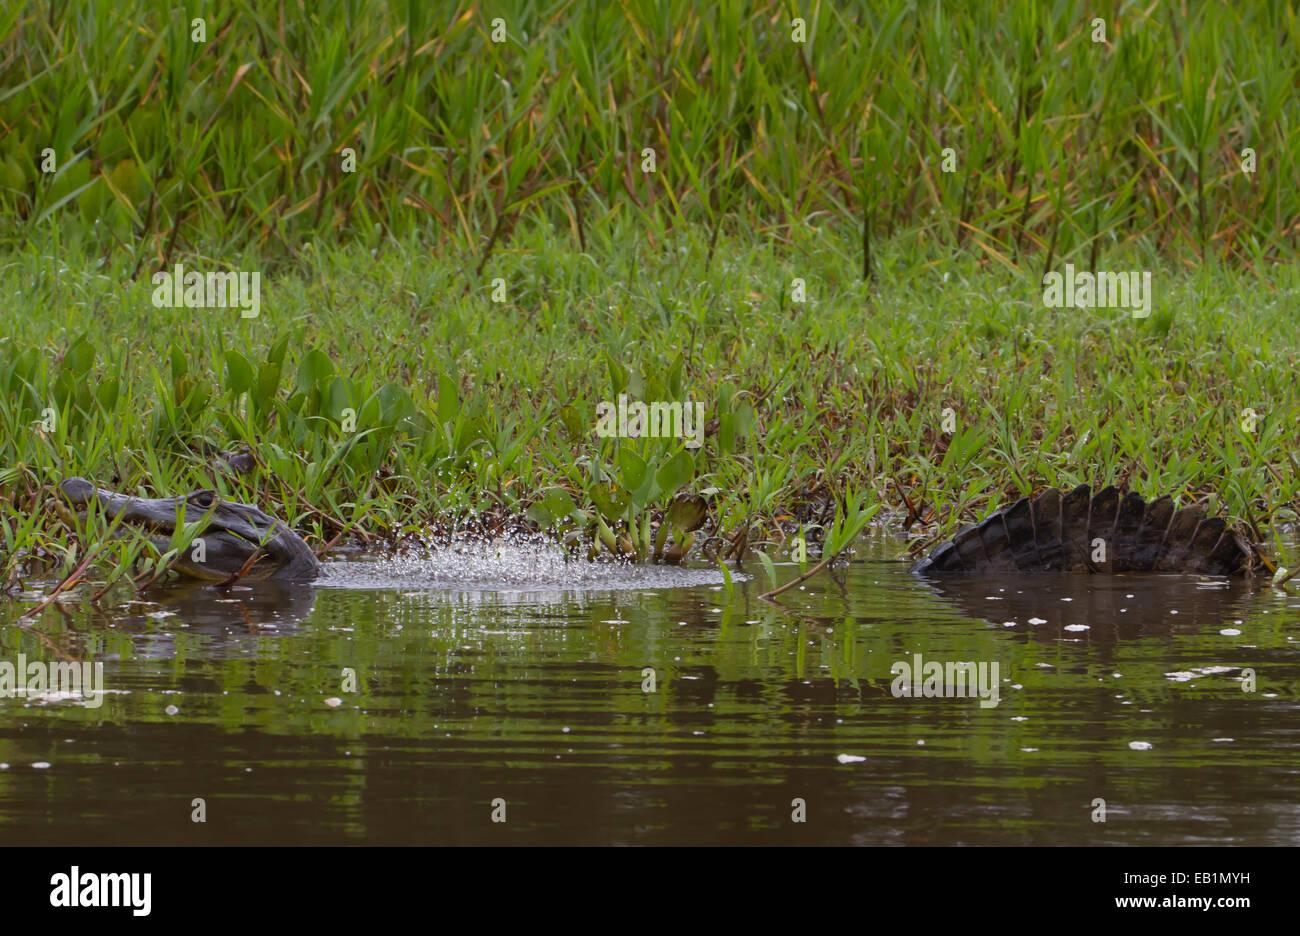 Jacare (Yacare) Caiman (Caiman yacare) in Pantanal region of Mato Grosso state, Brazil - Stock Image